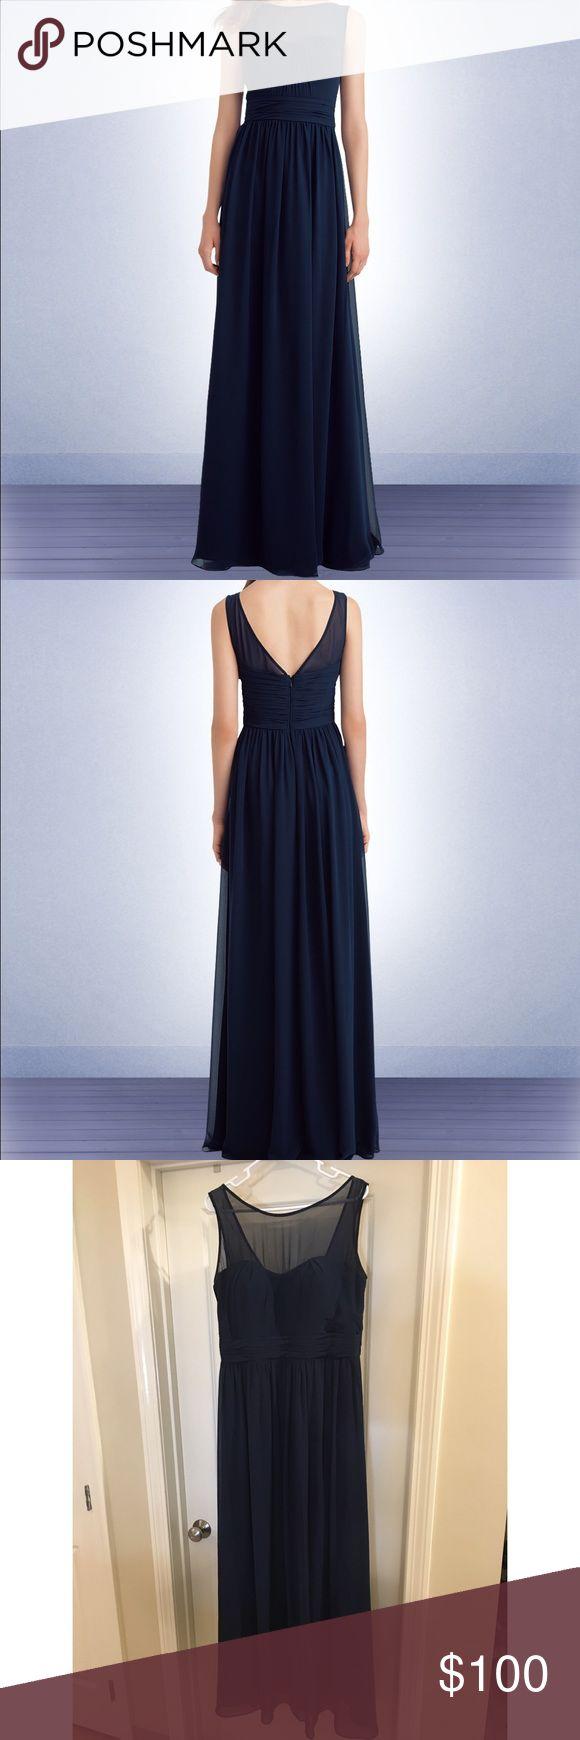 best bridesmaid dress ideas images on pinterest bill levkoff